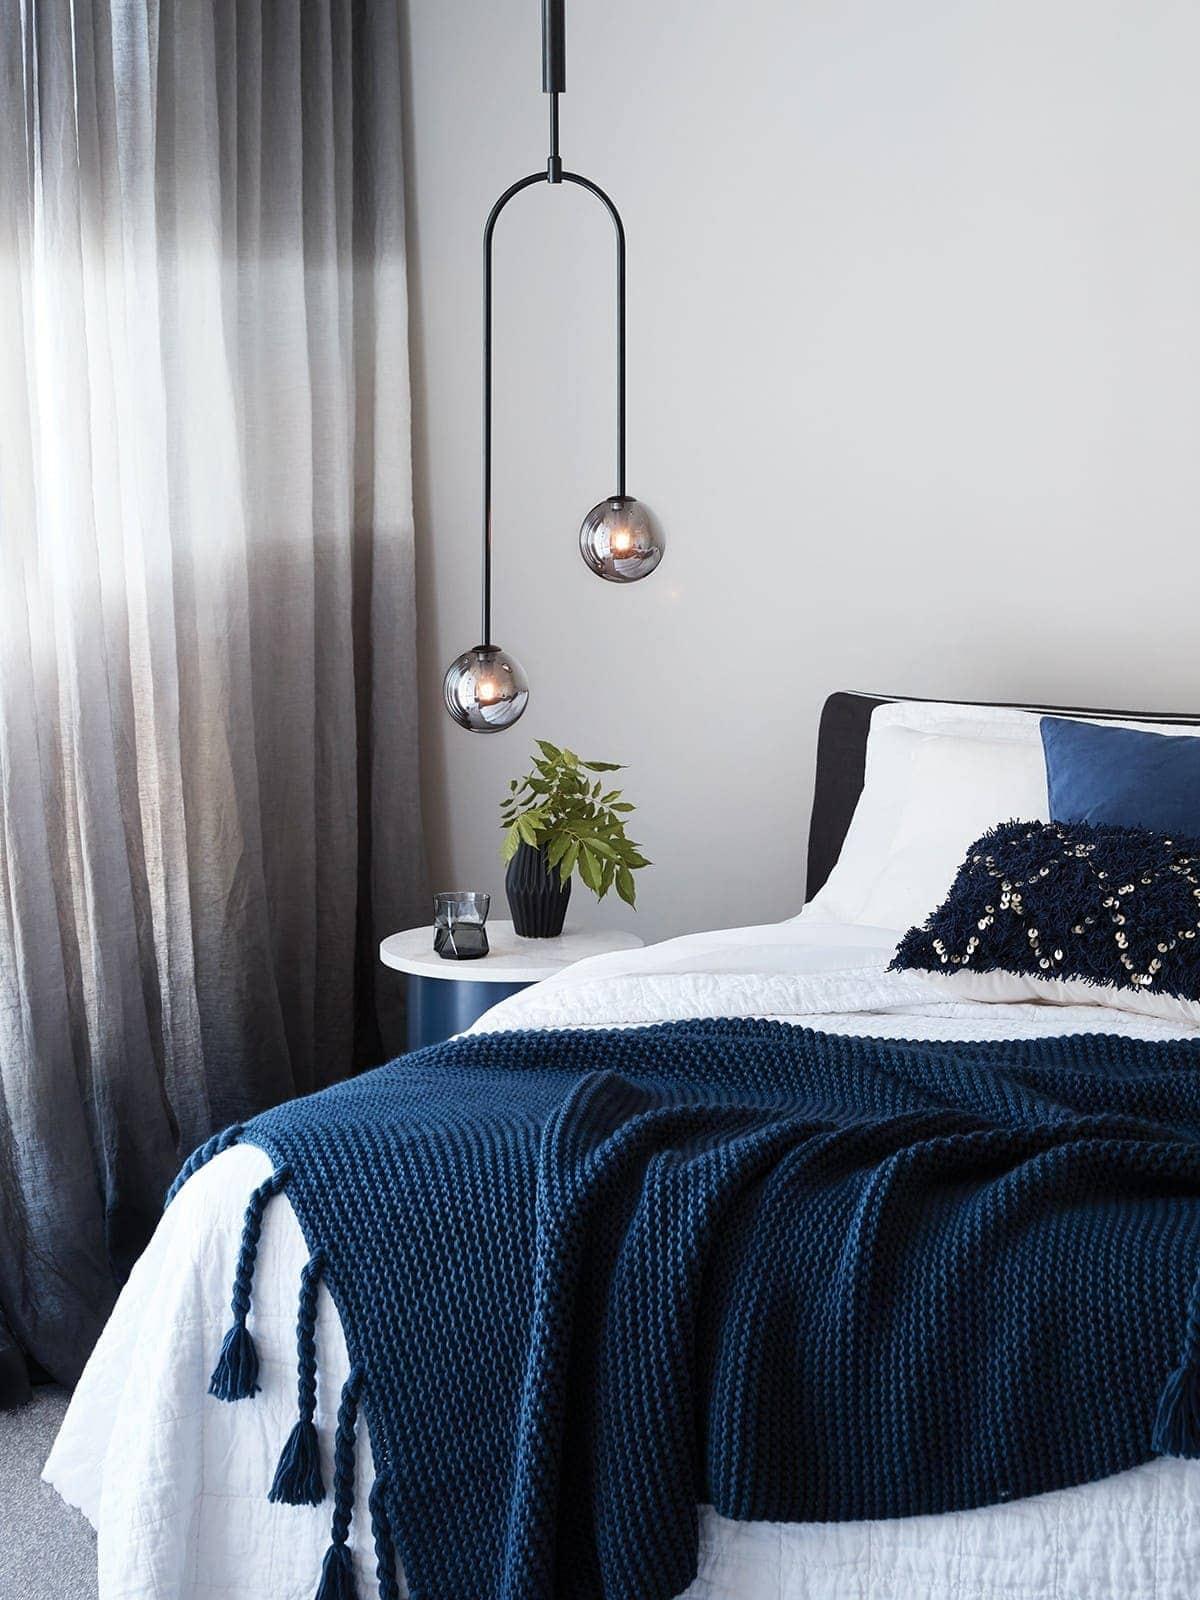 Choosing Pendant Lights For A Master Bedroom Tlc Interiors